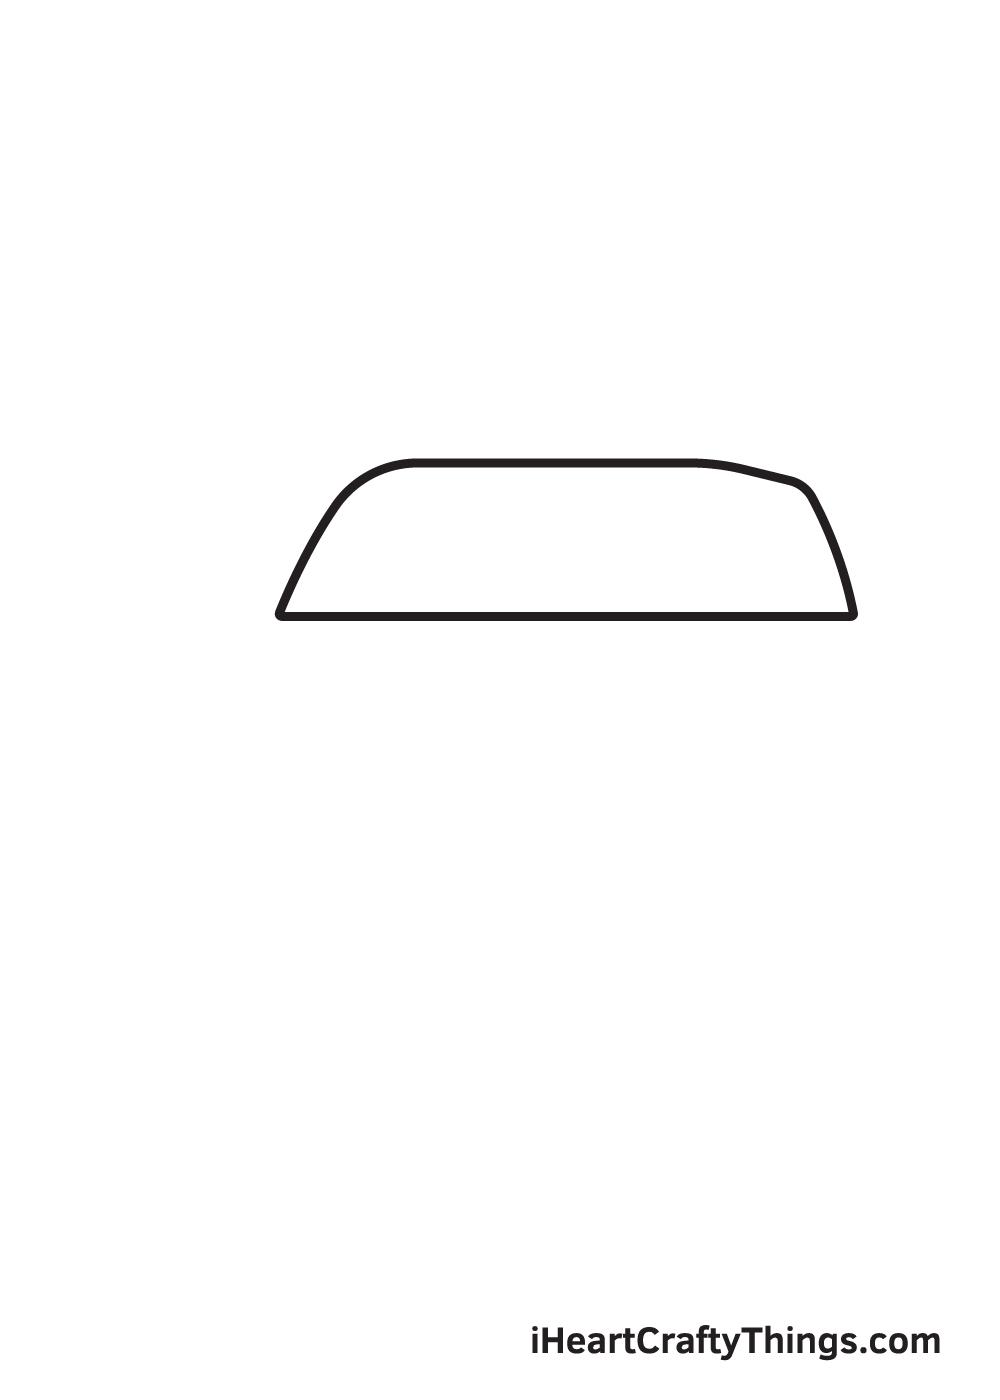 tank drawing step 1